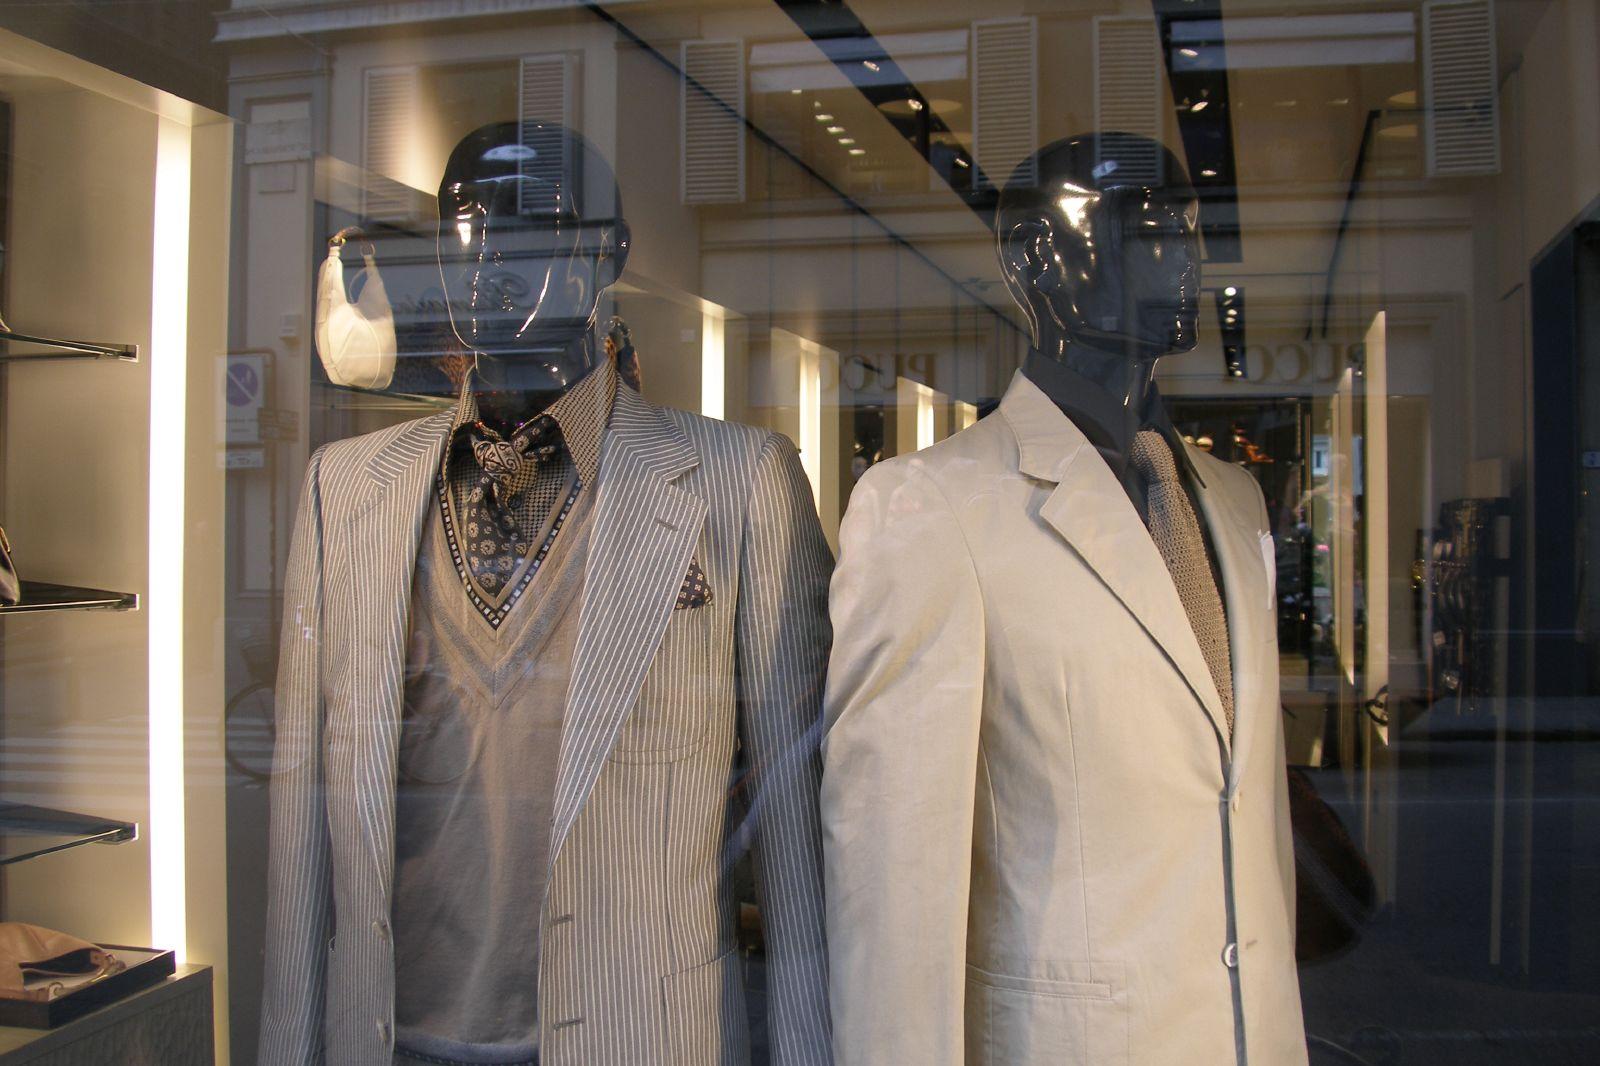 YSL_Menswear_shop_in_Florence